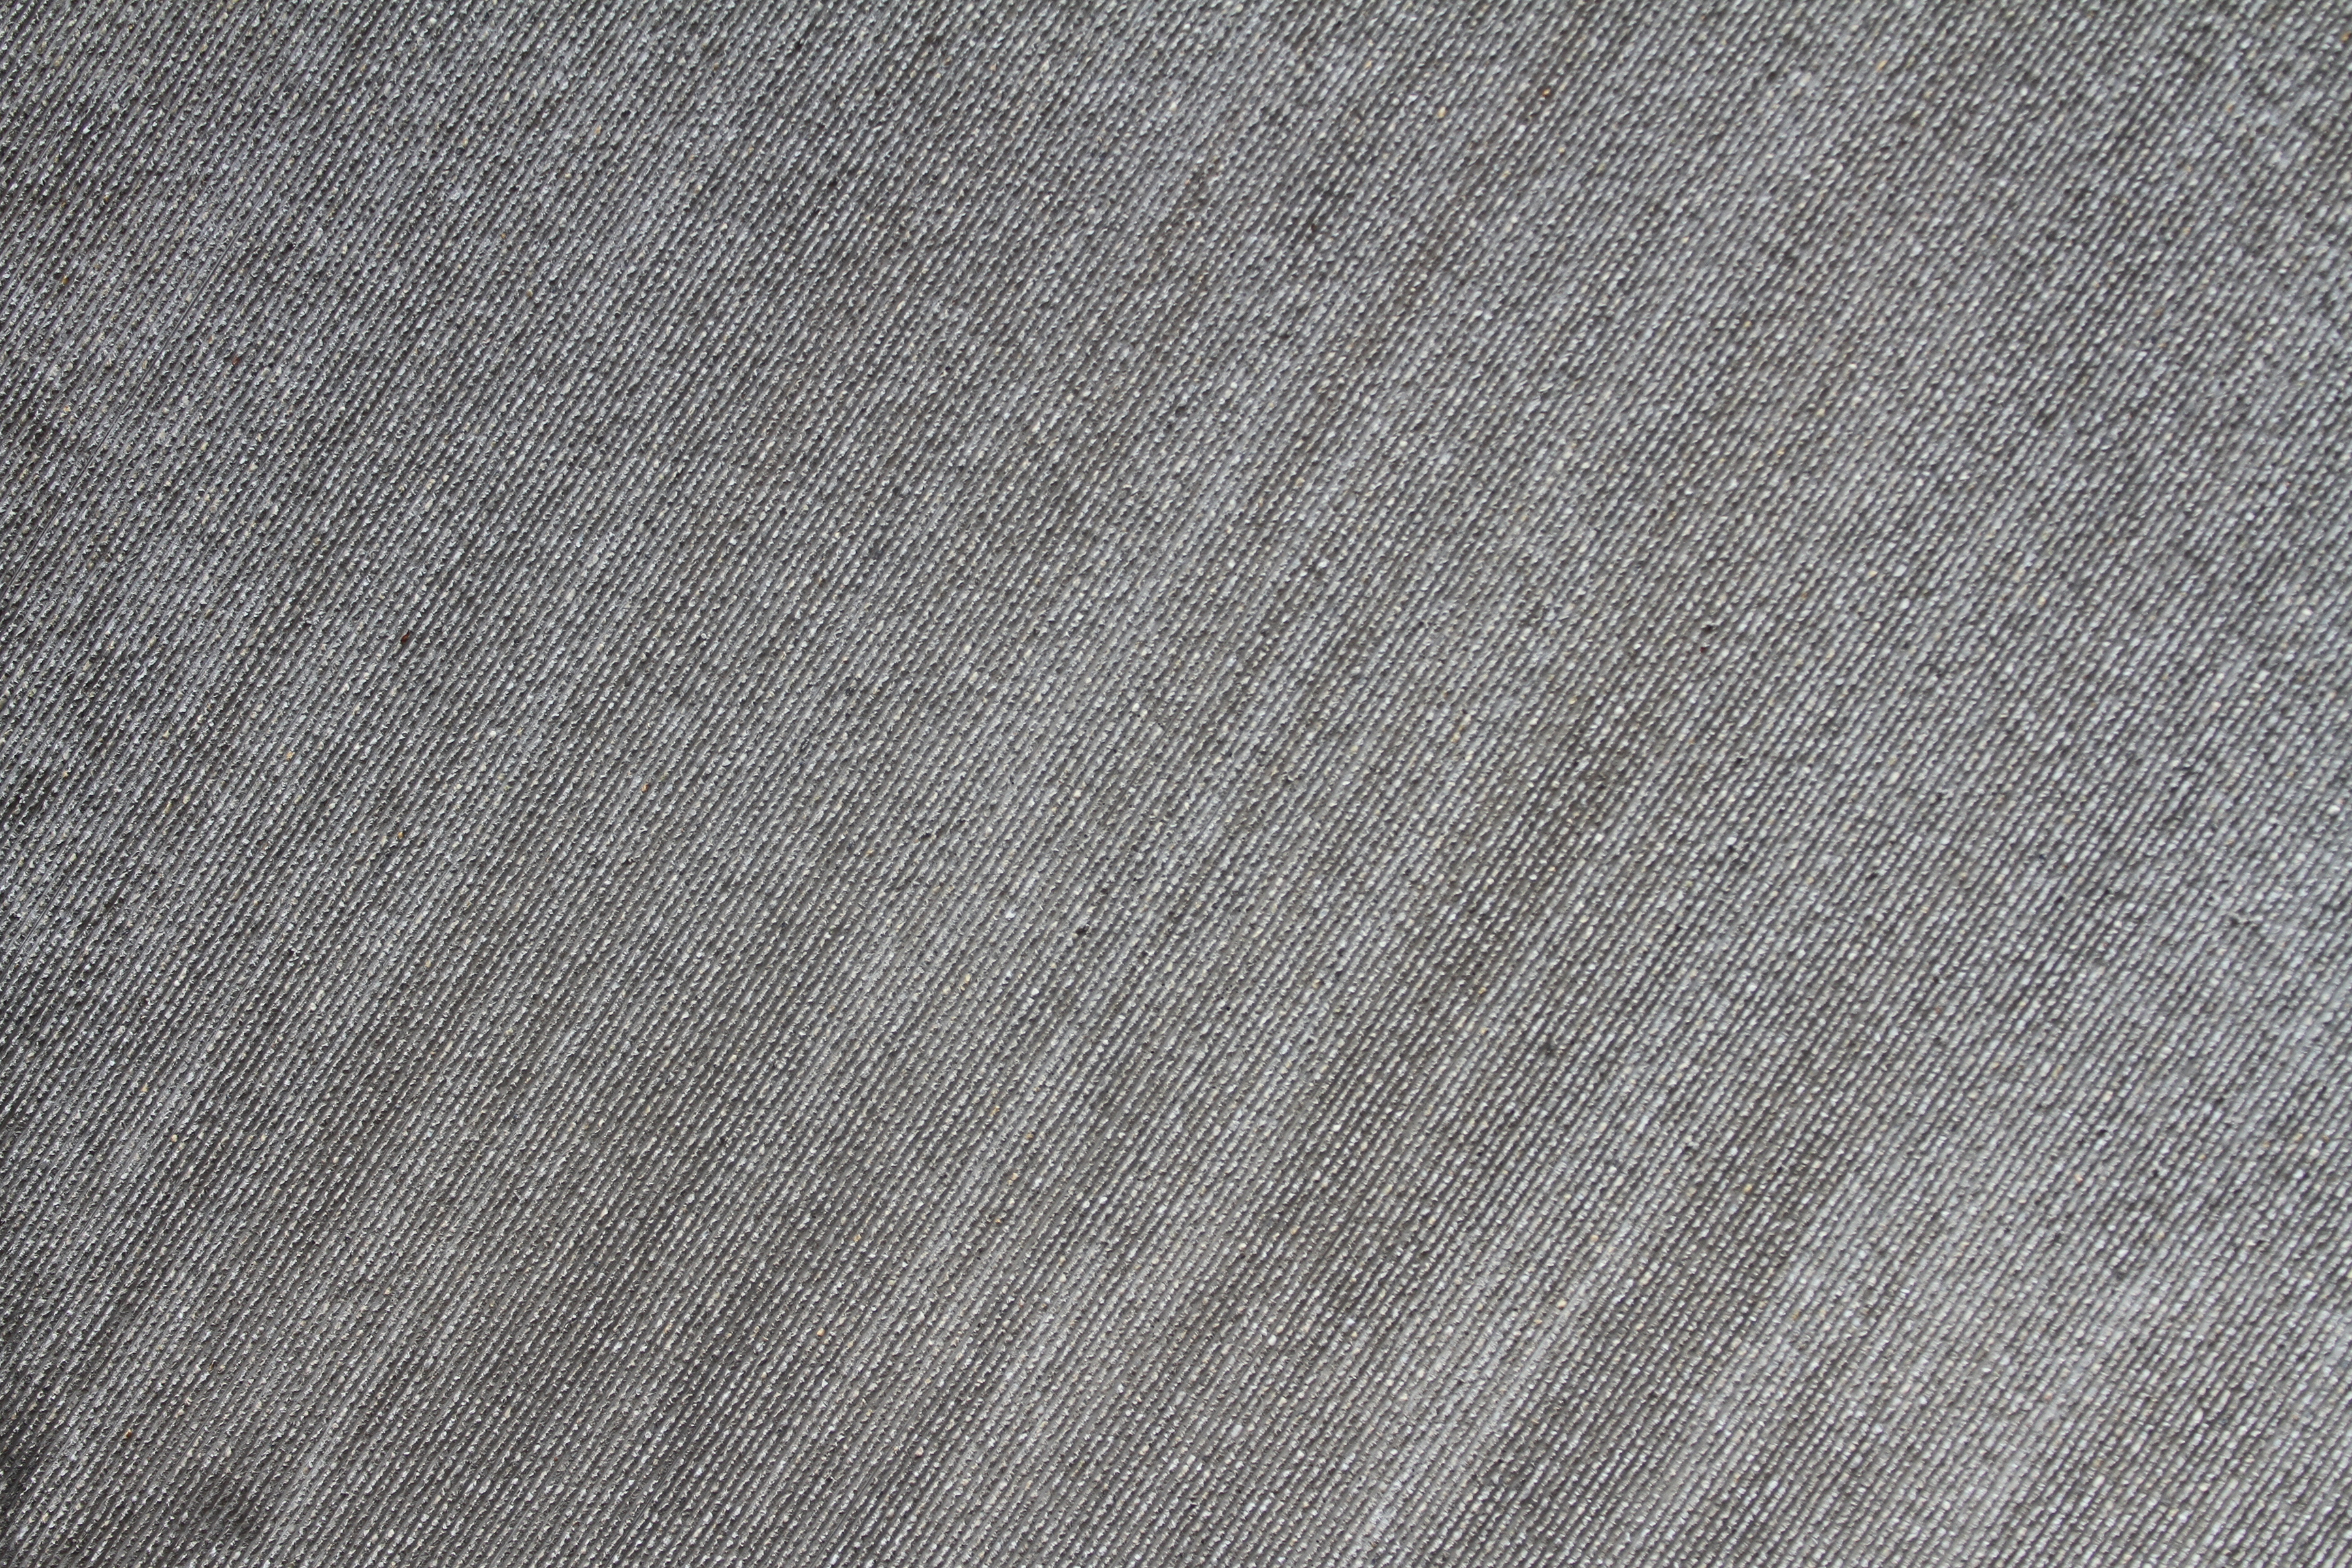 Thin Striped Concrete Texture - 14Textures